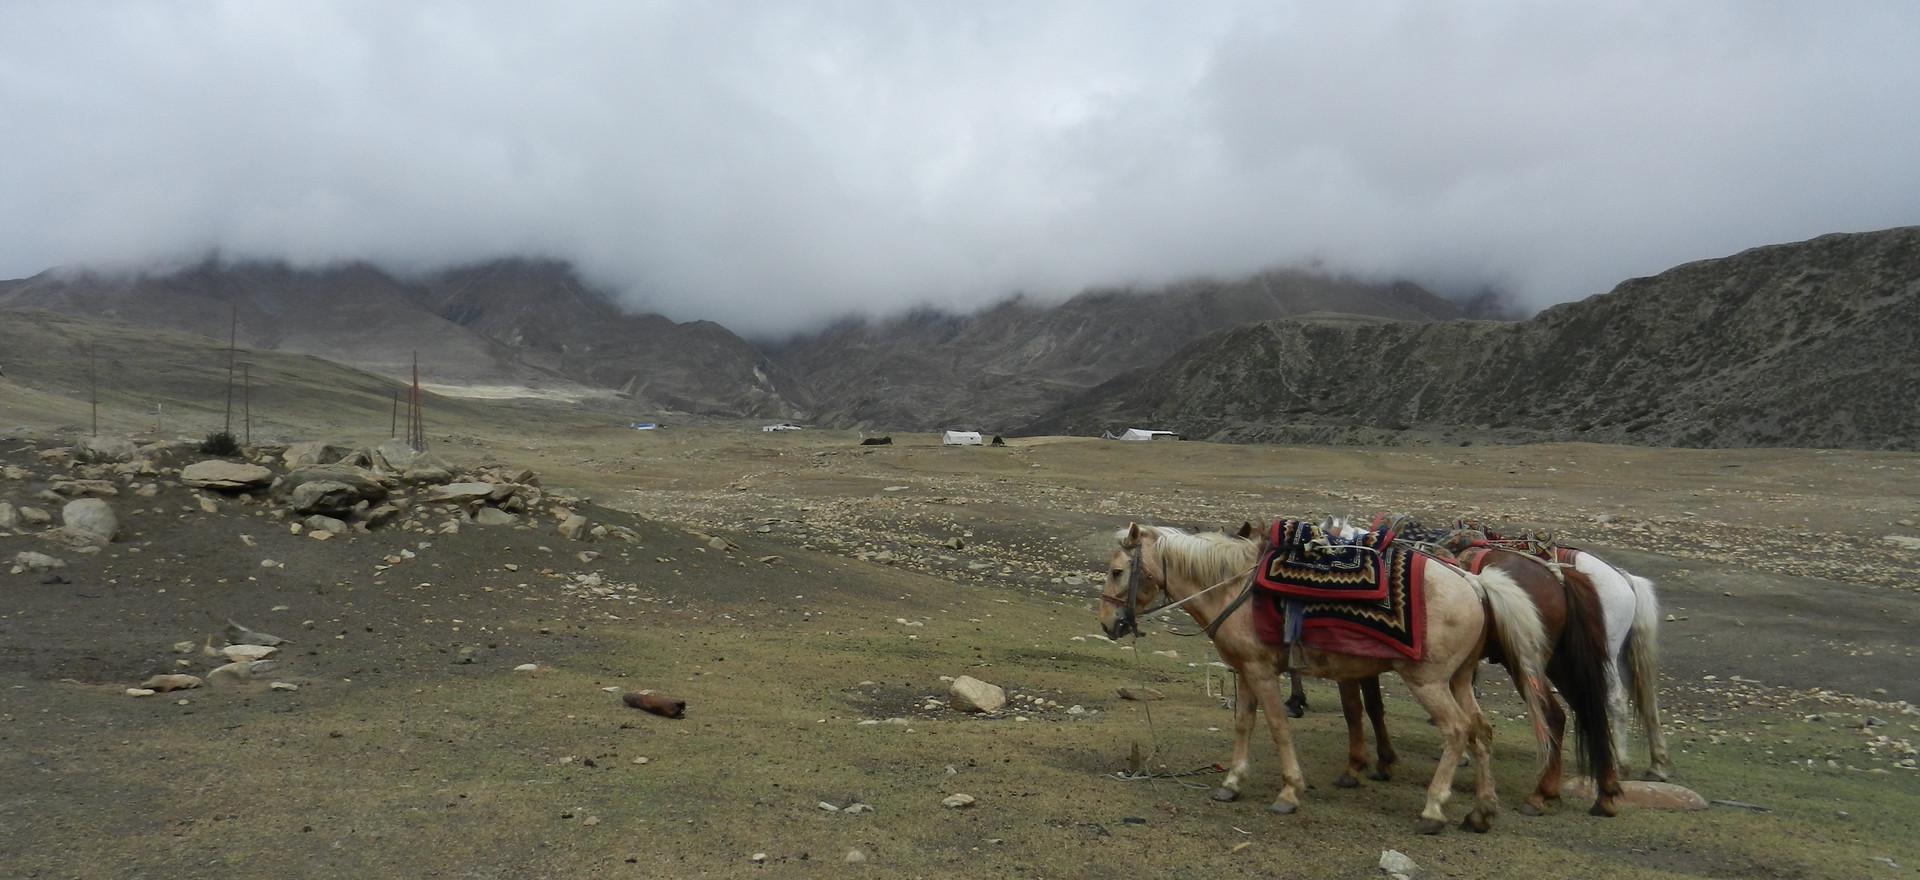 Upper Mustang